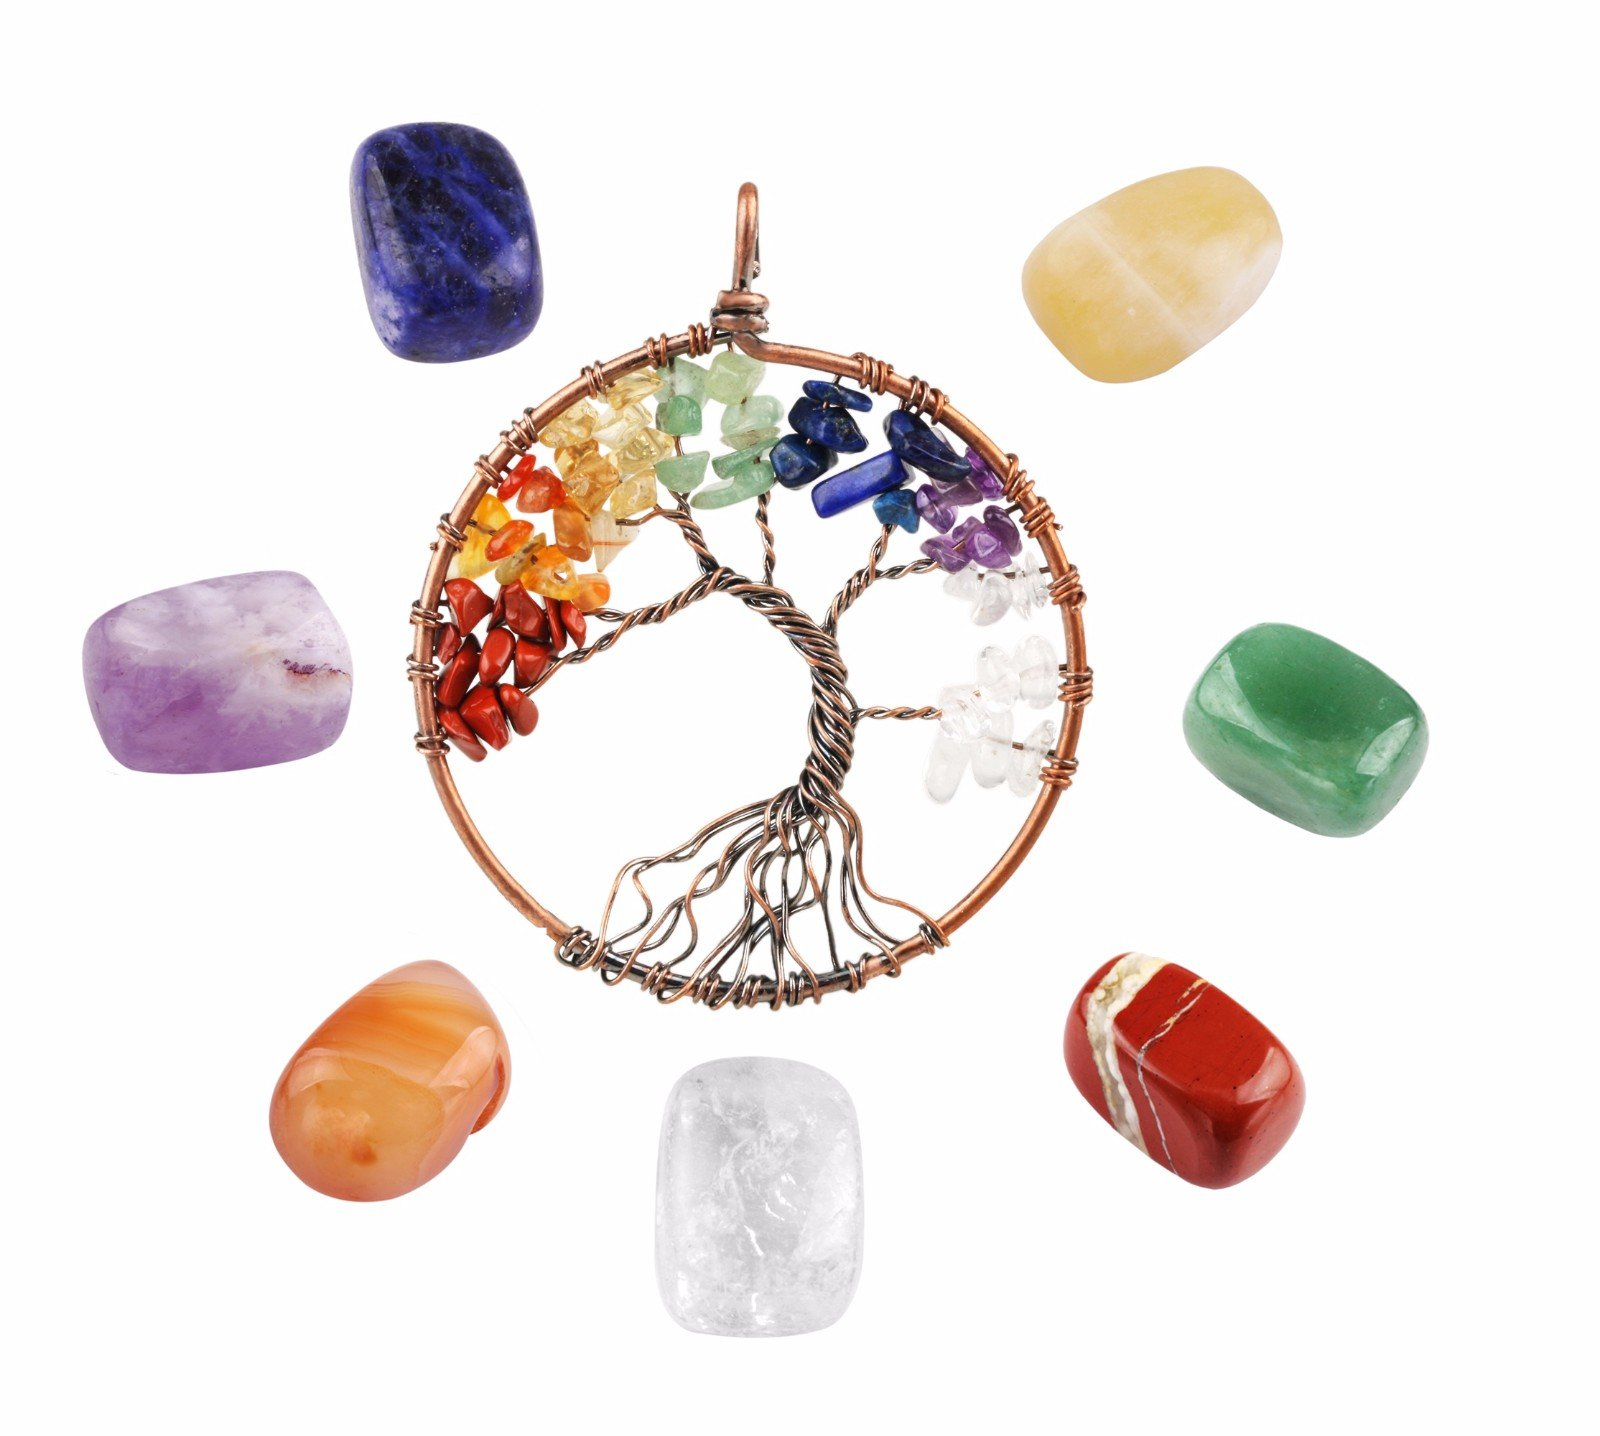 rockcloud Healing Crystal Kit,7 Chakra Stones & Tree of Life Pendant Set